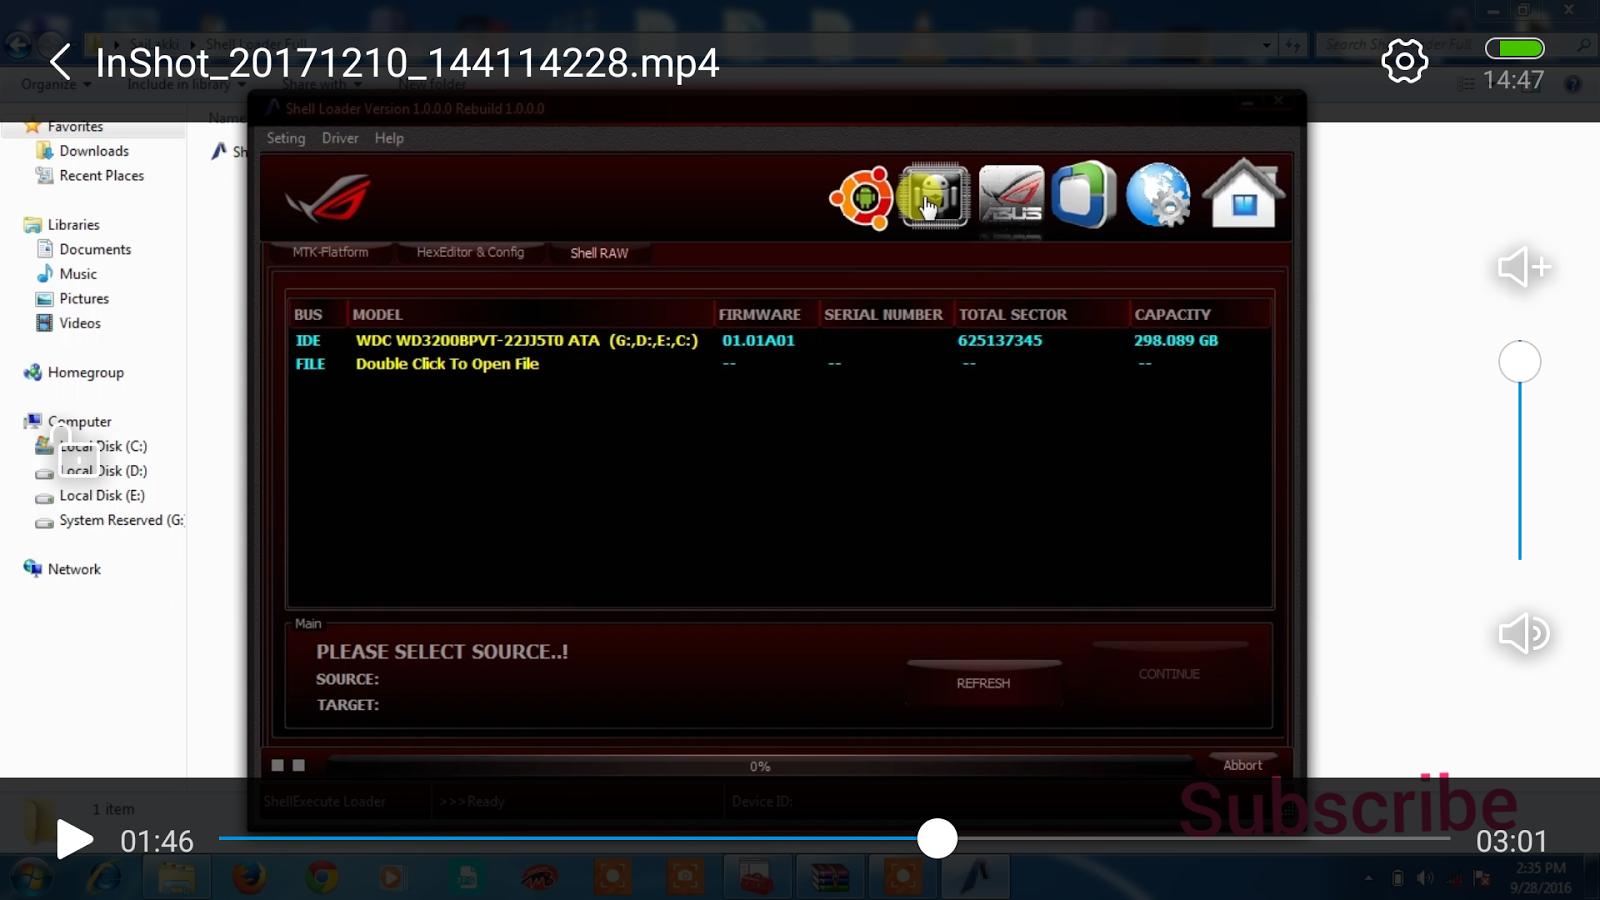 Mobileteam1 Android Shell Loader V1 Crack